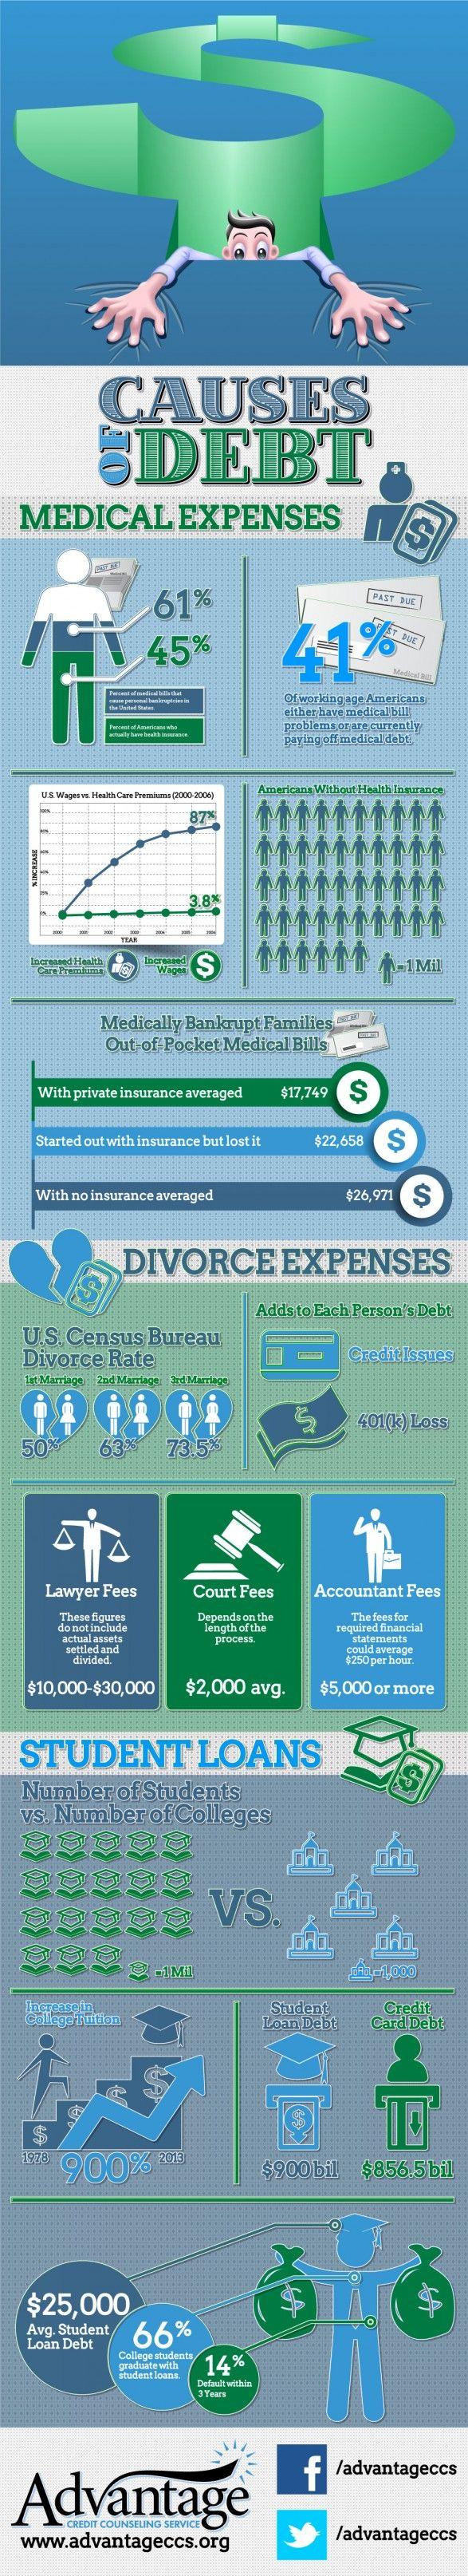 credit cards in divorce